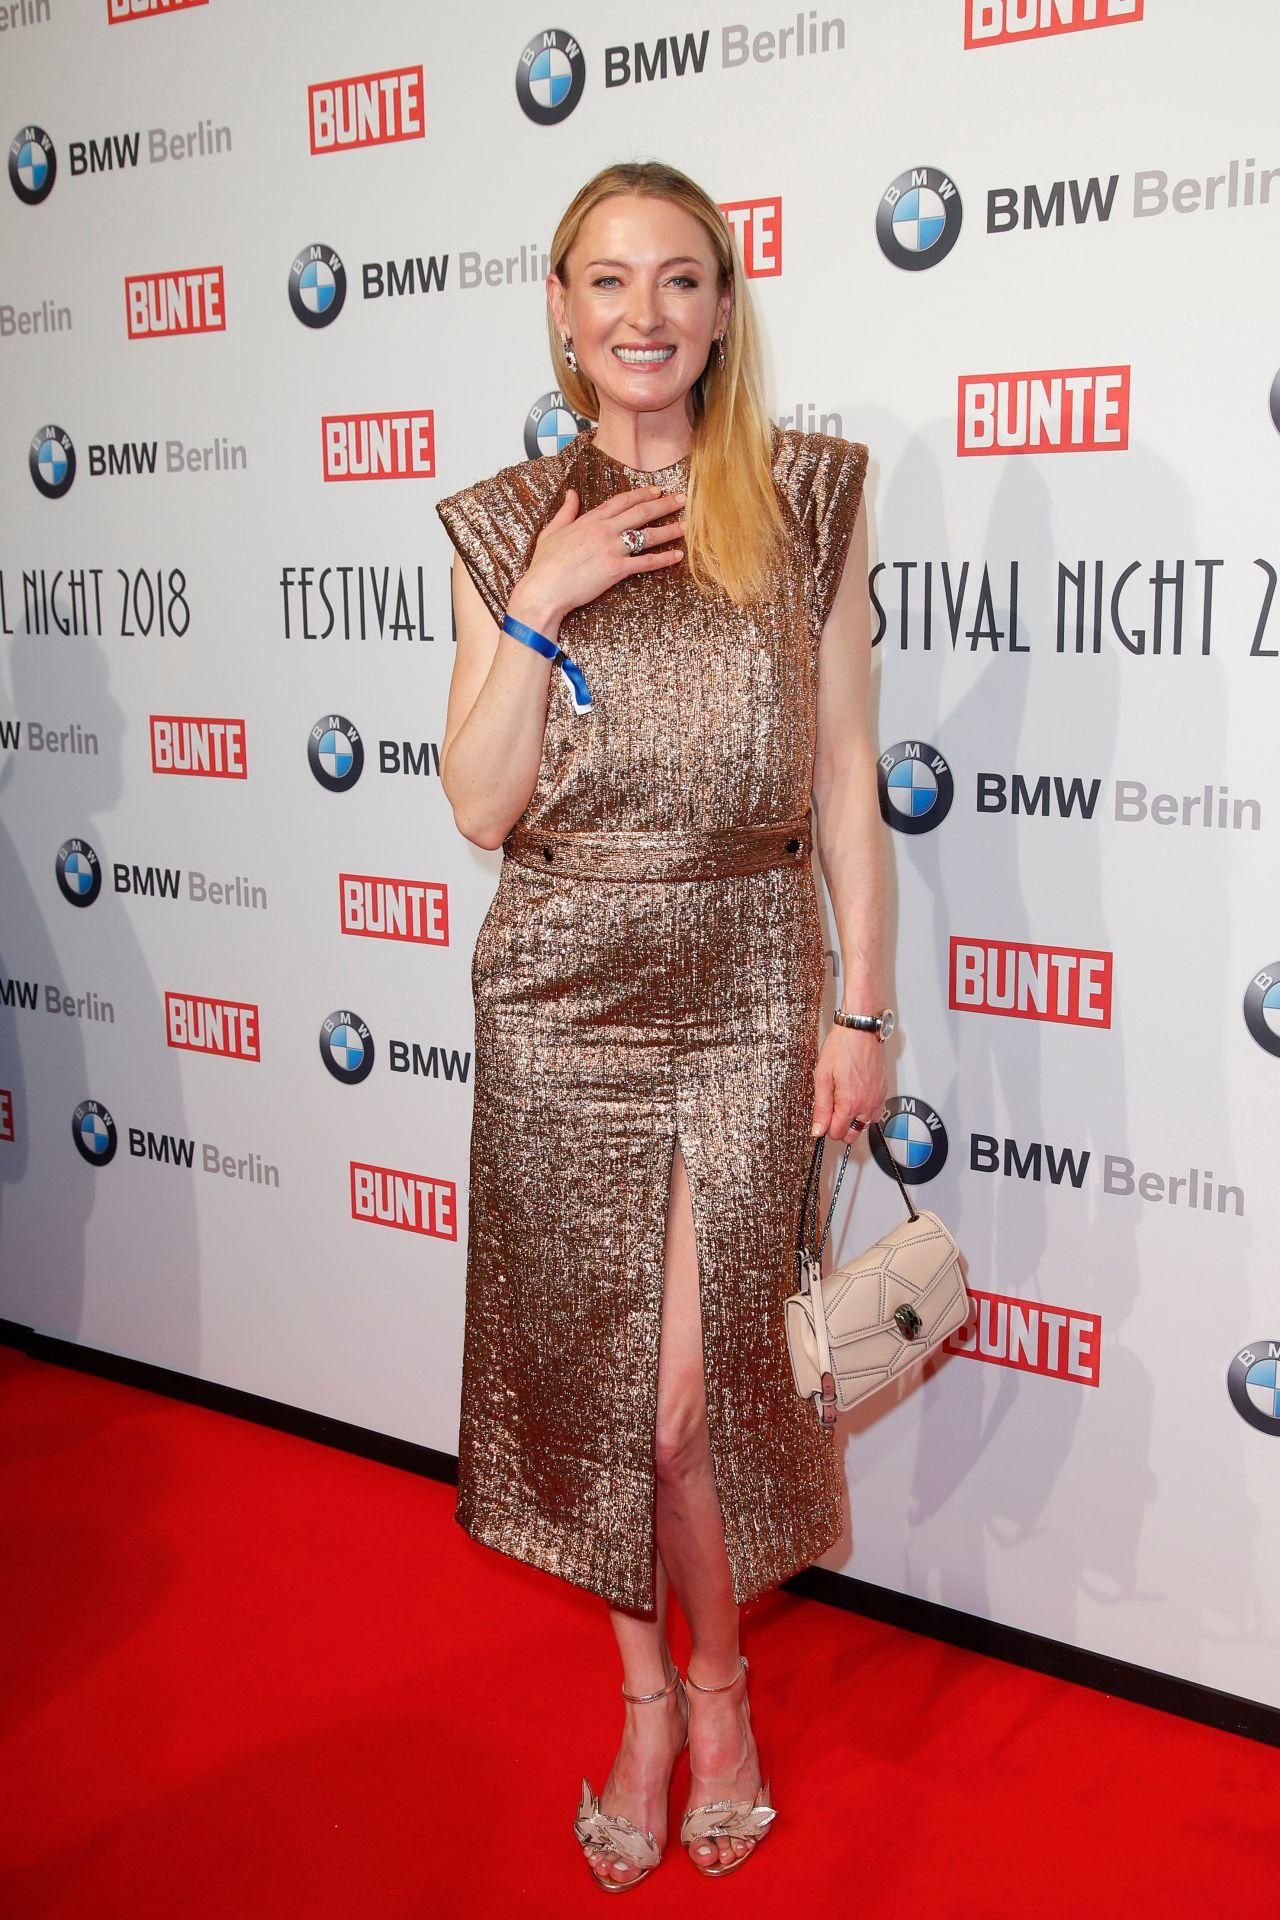 Lilly Zu Sayn Wittgenstein Berleburg Bunte Bmw Host Festival